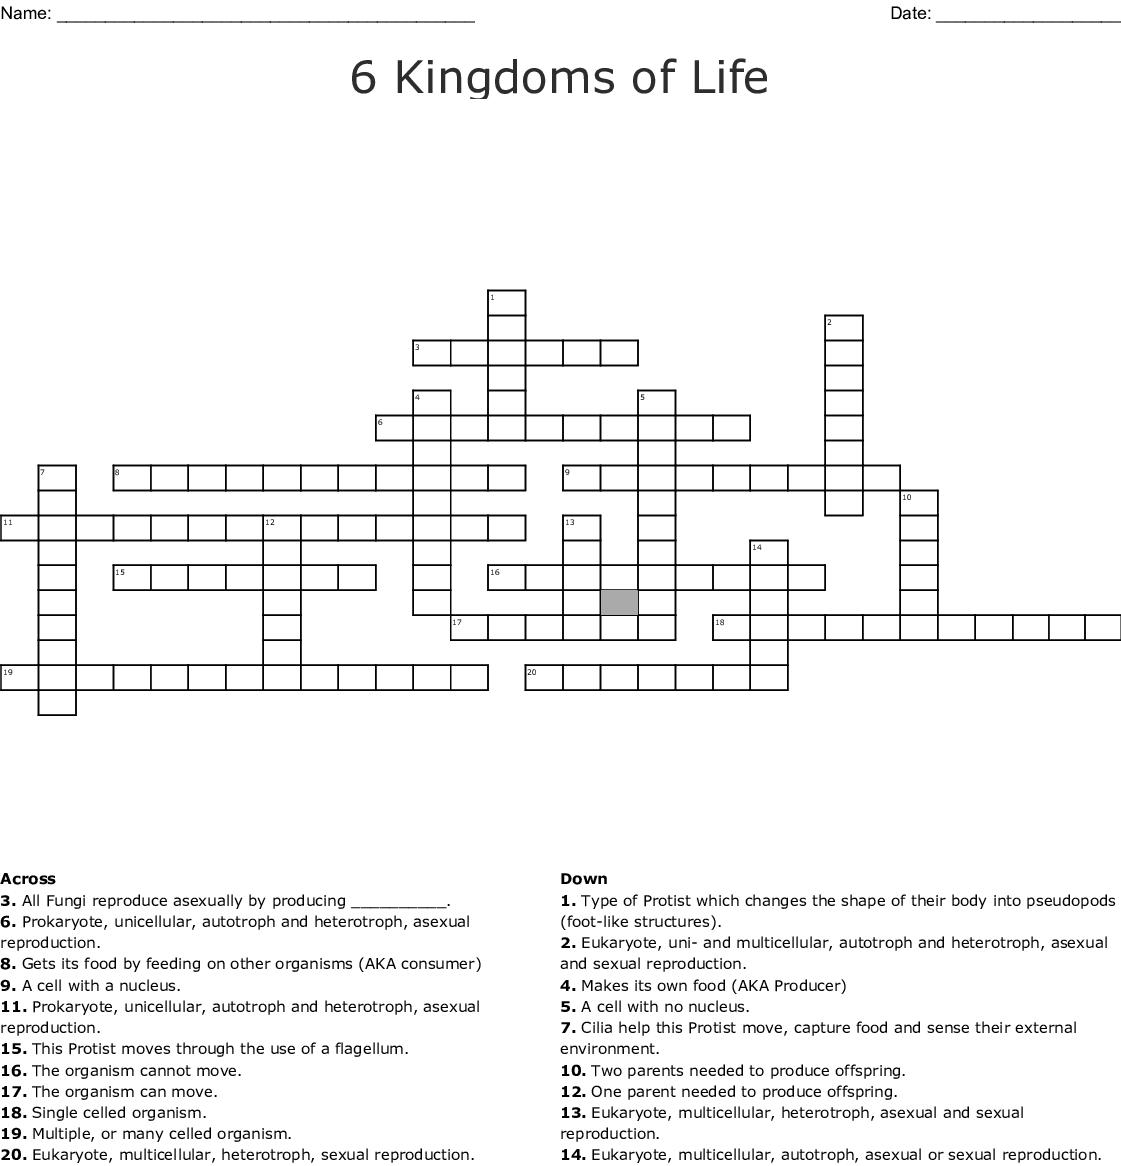 6 Kingdoms Of Life Crossword